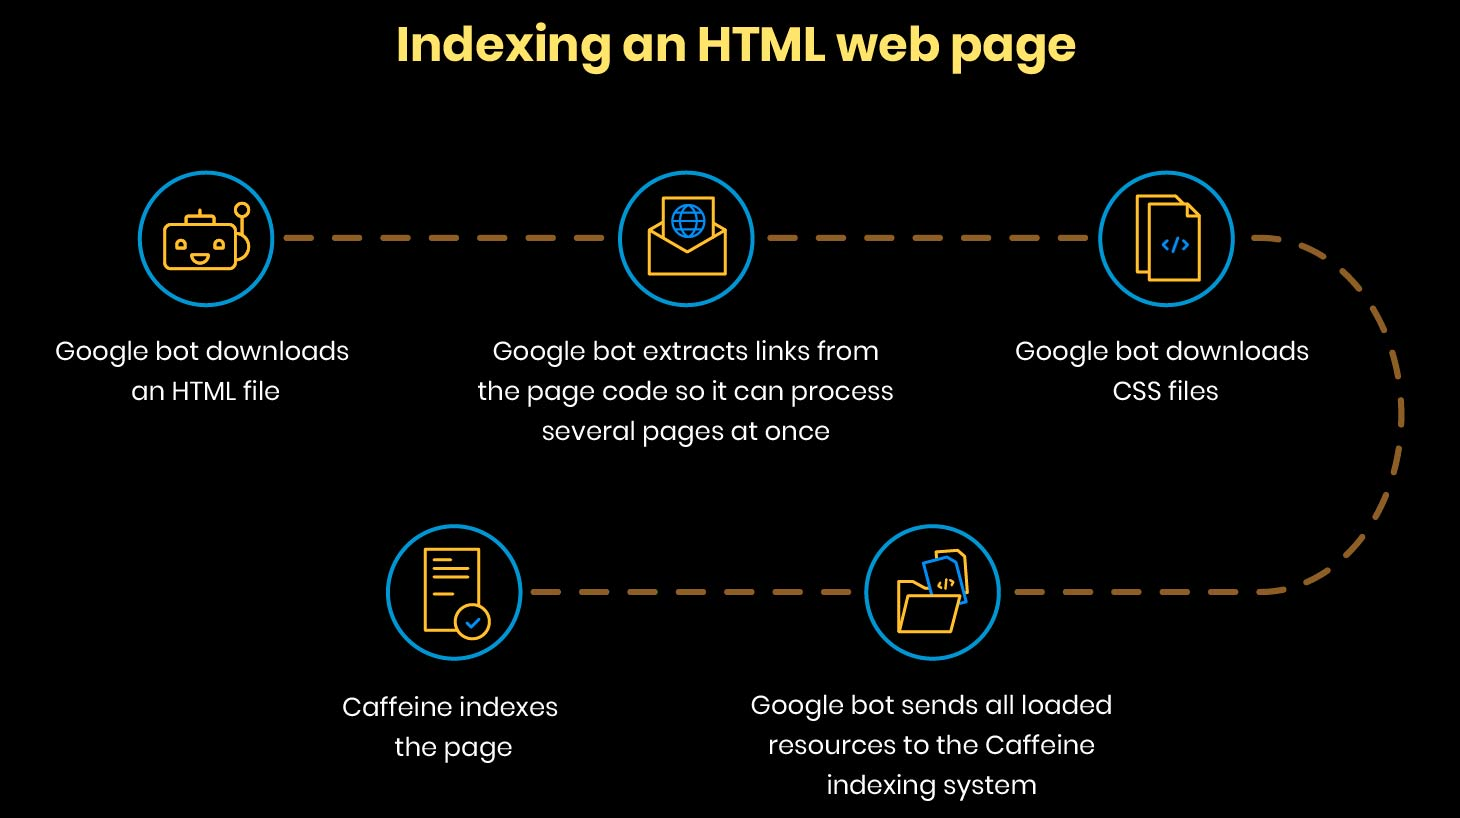 indexando una pagina html